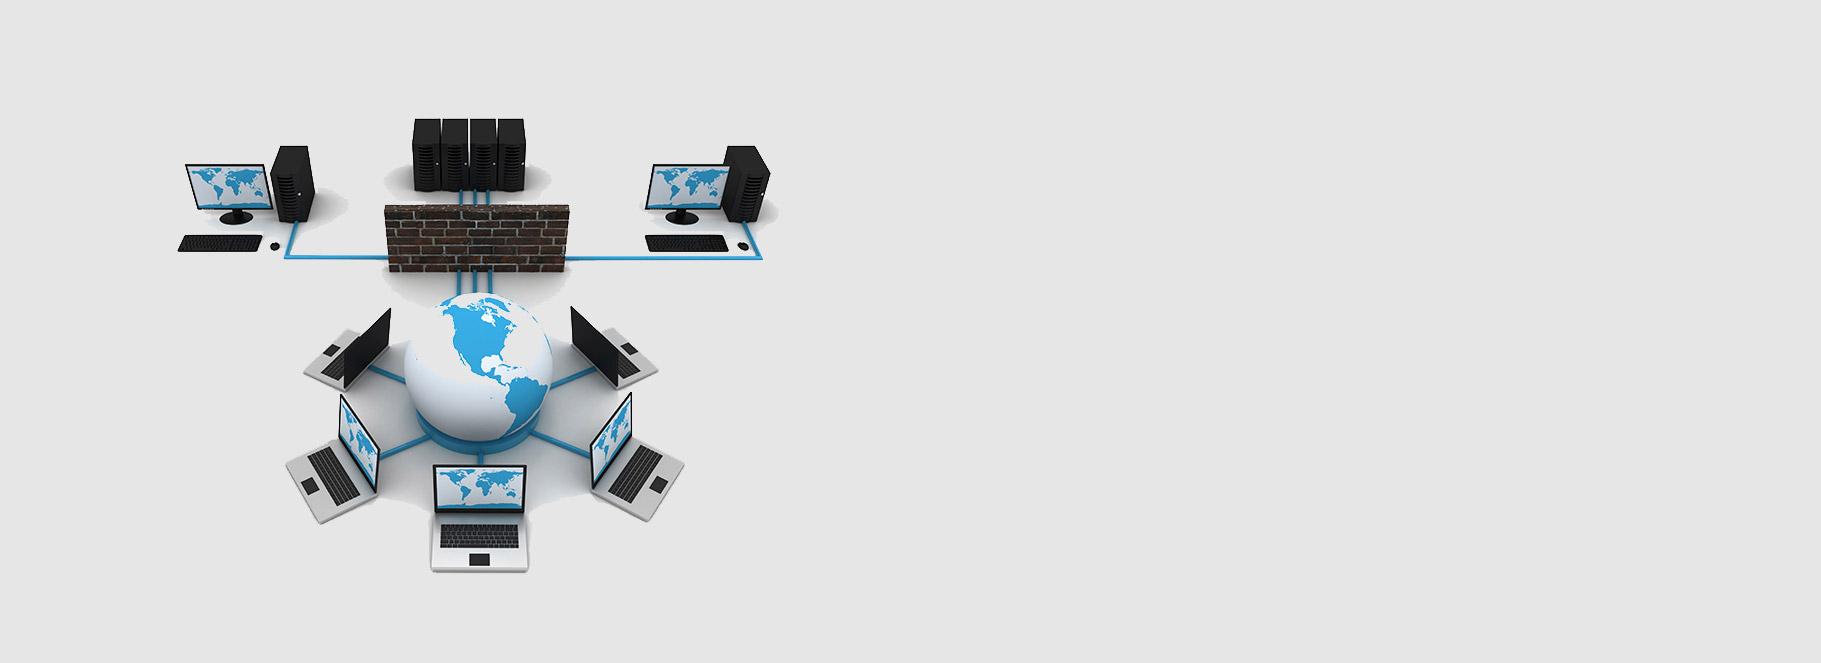 slider-banner-network-computer-04